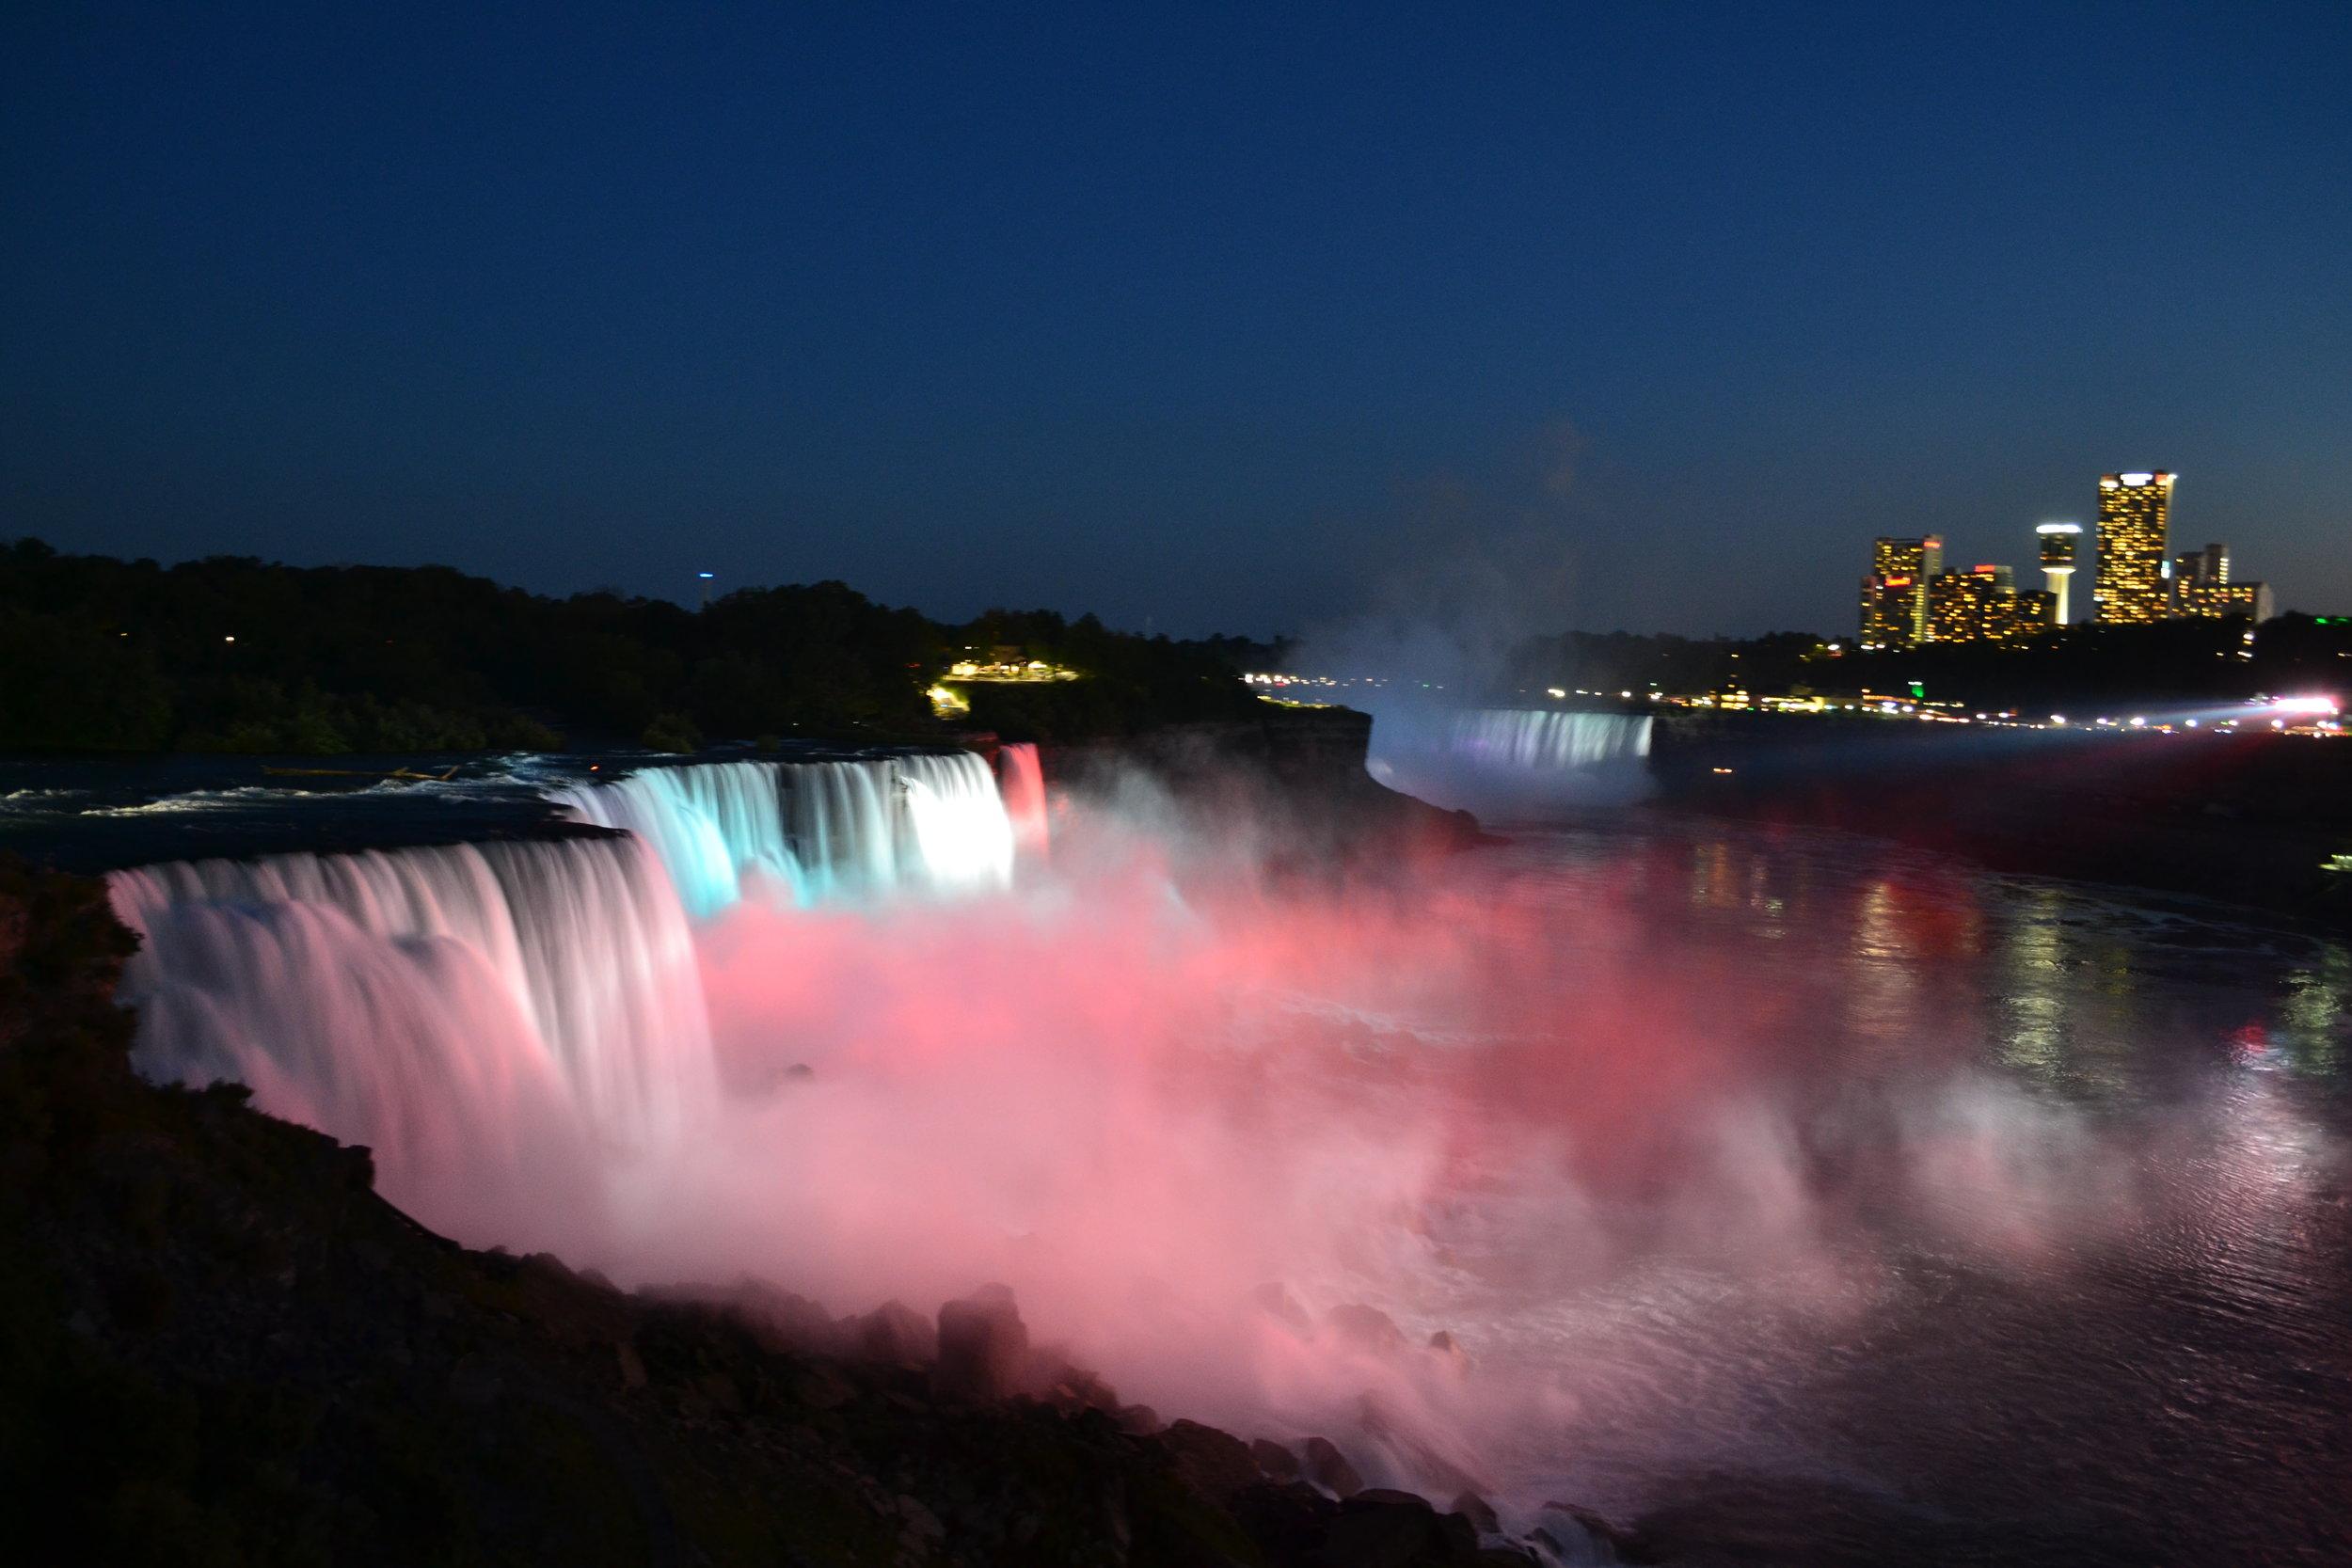 Niagara Falls at night -- it's quite a sight!